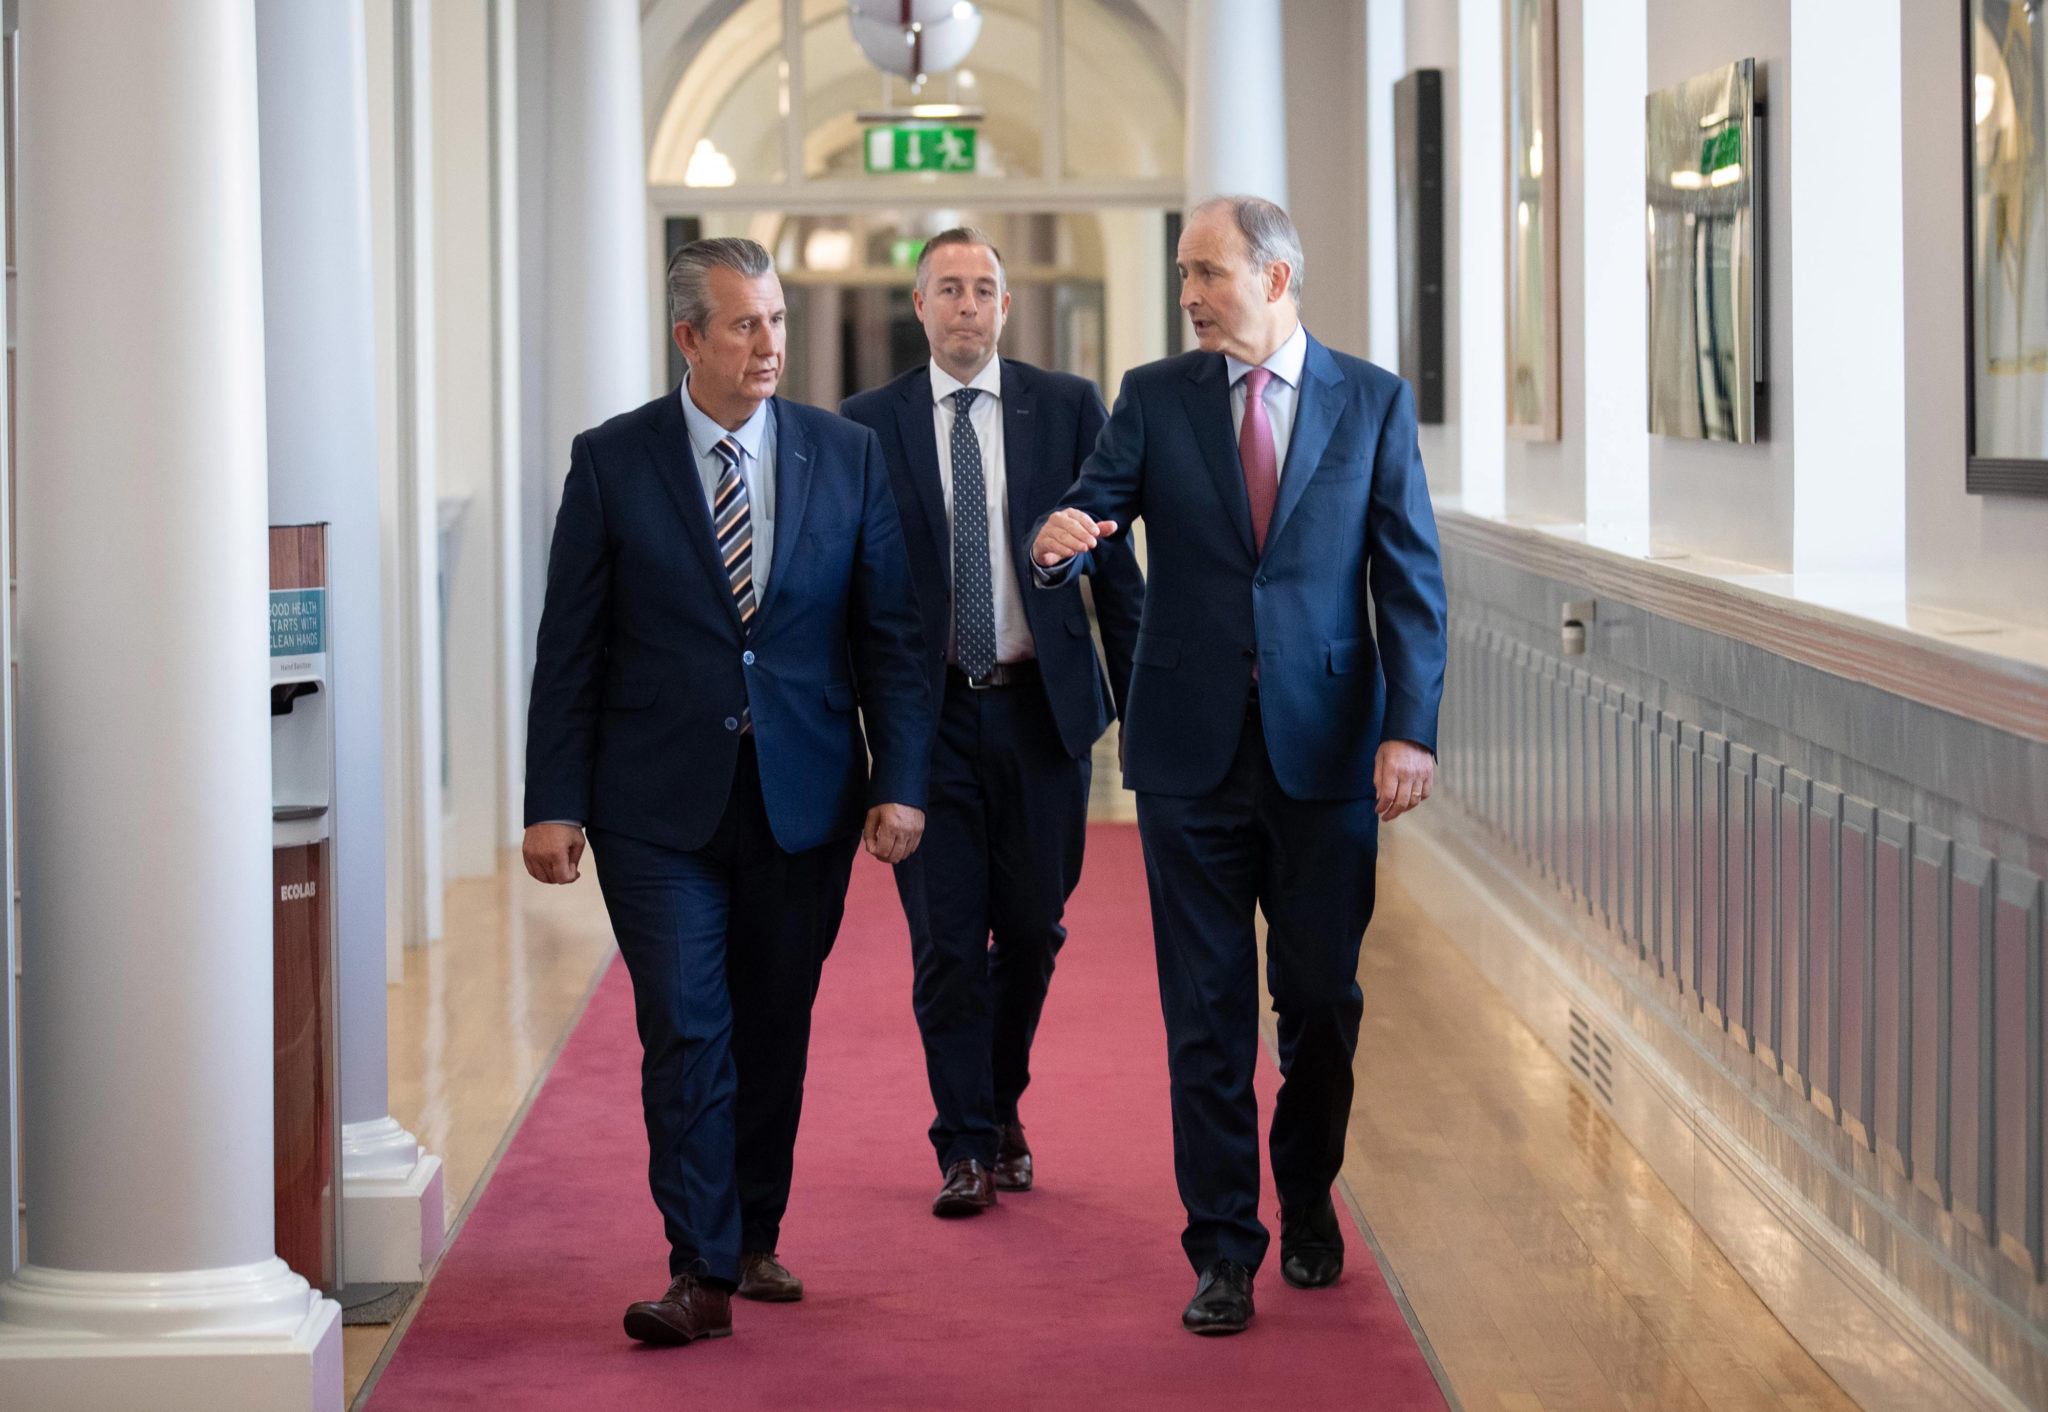 Taoiseach Micheál Martin meeting with DUP Leader Edwin Poots and DUP MLA Paul Givan